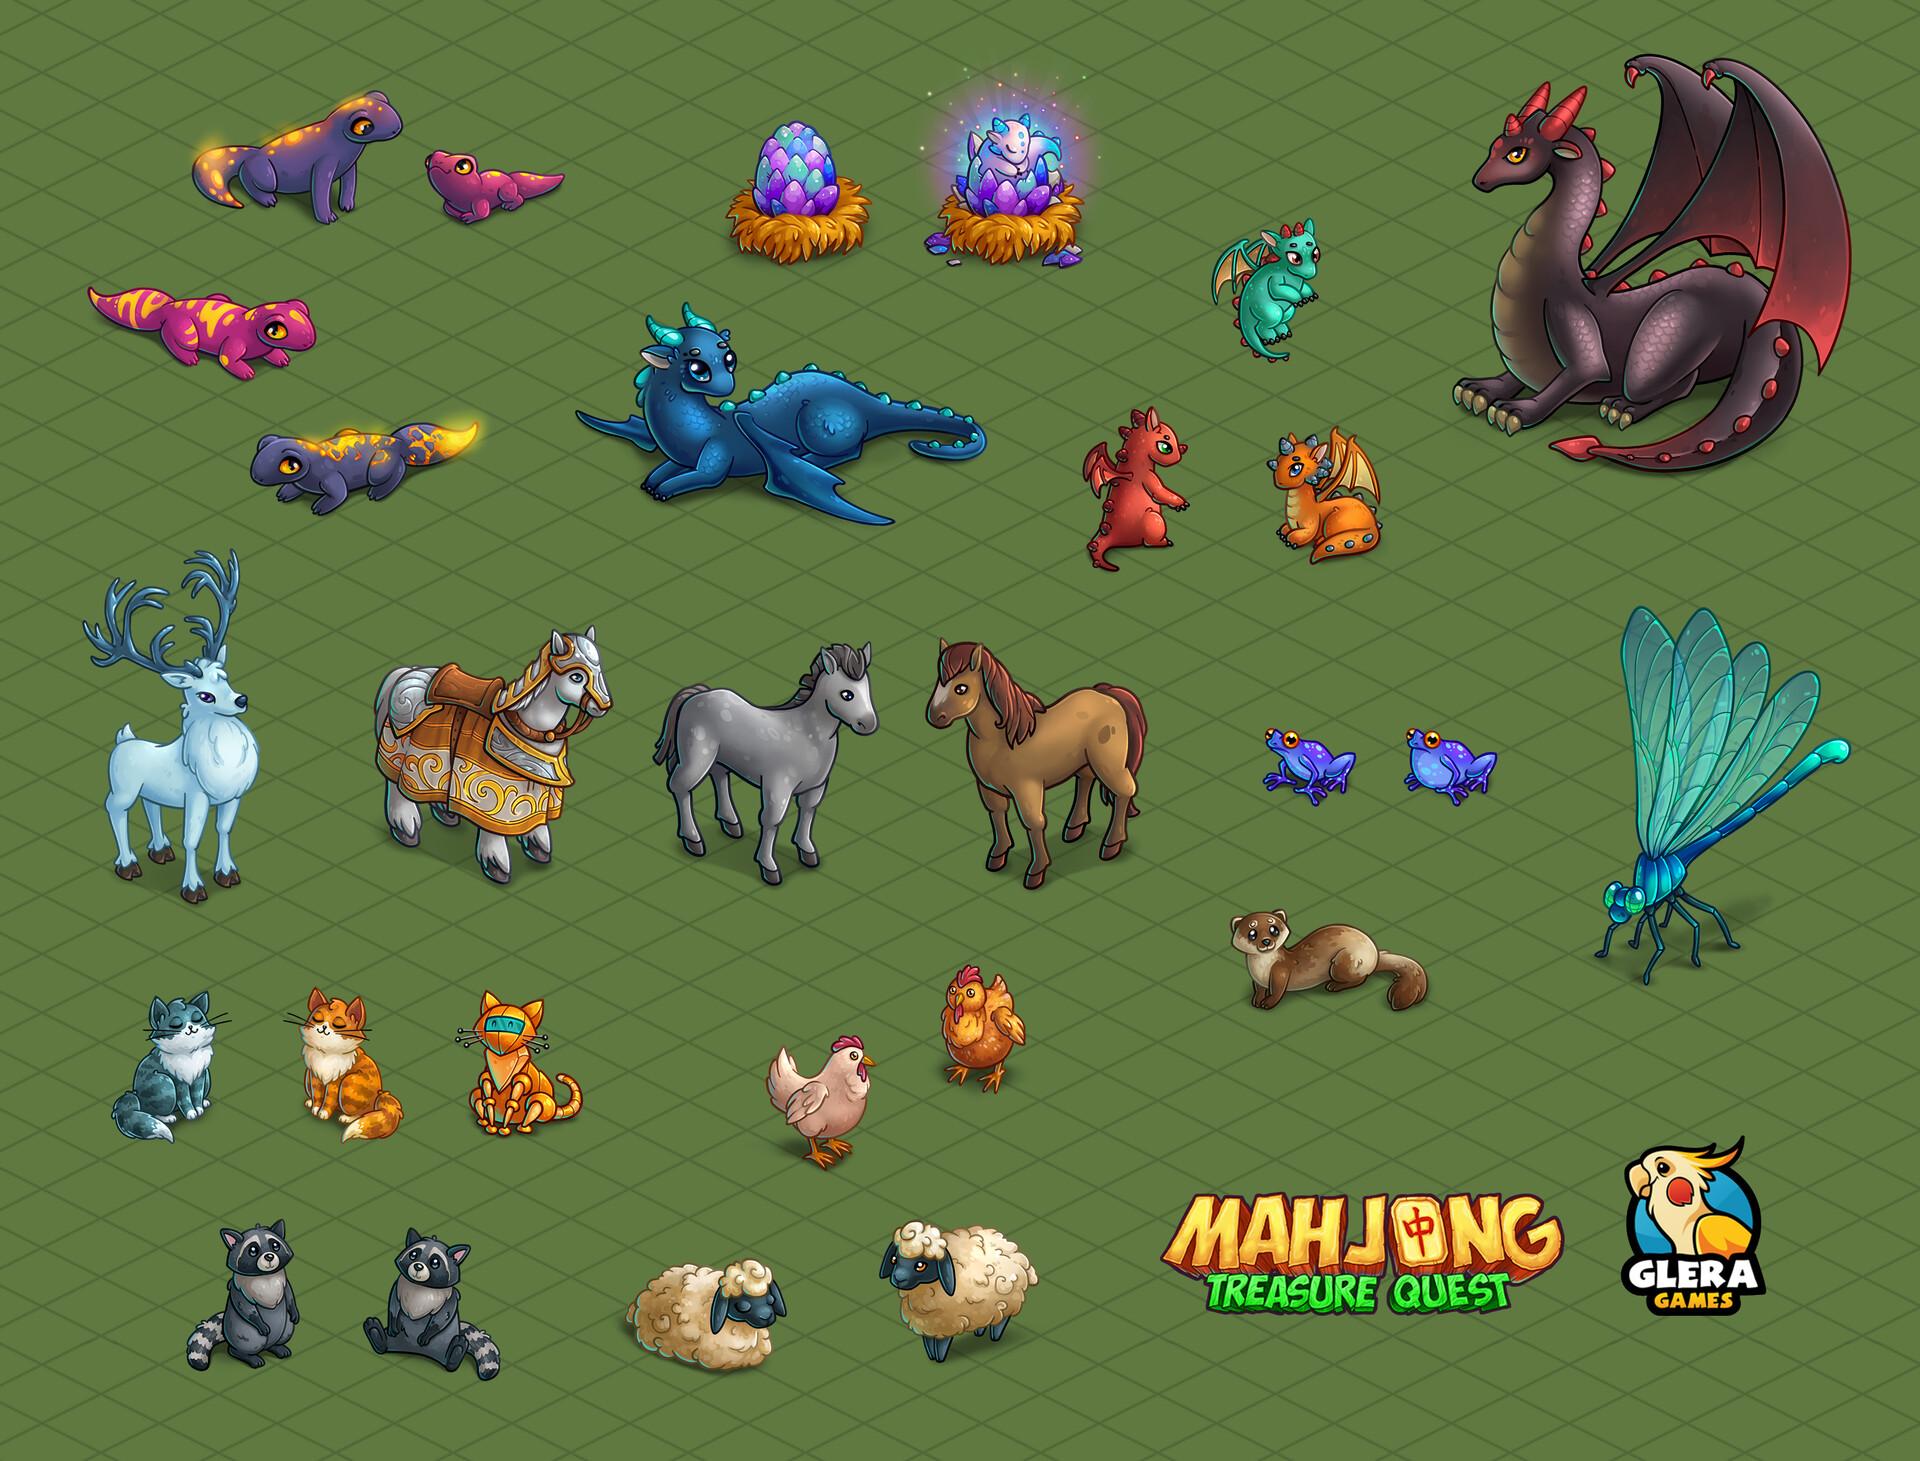 ArtStation - Artwork for Mahjong Treasure Quest  Part 2